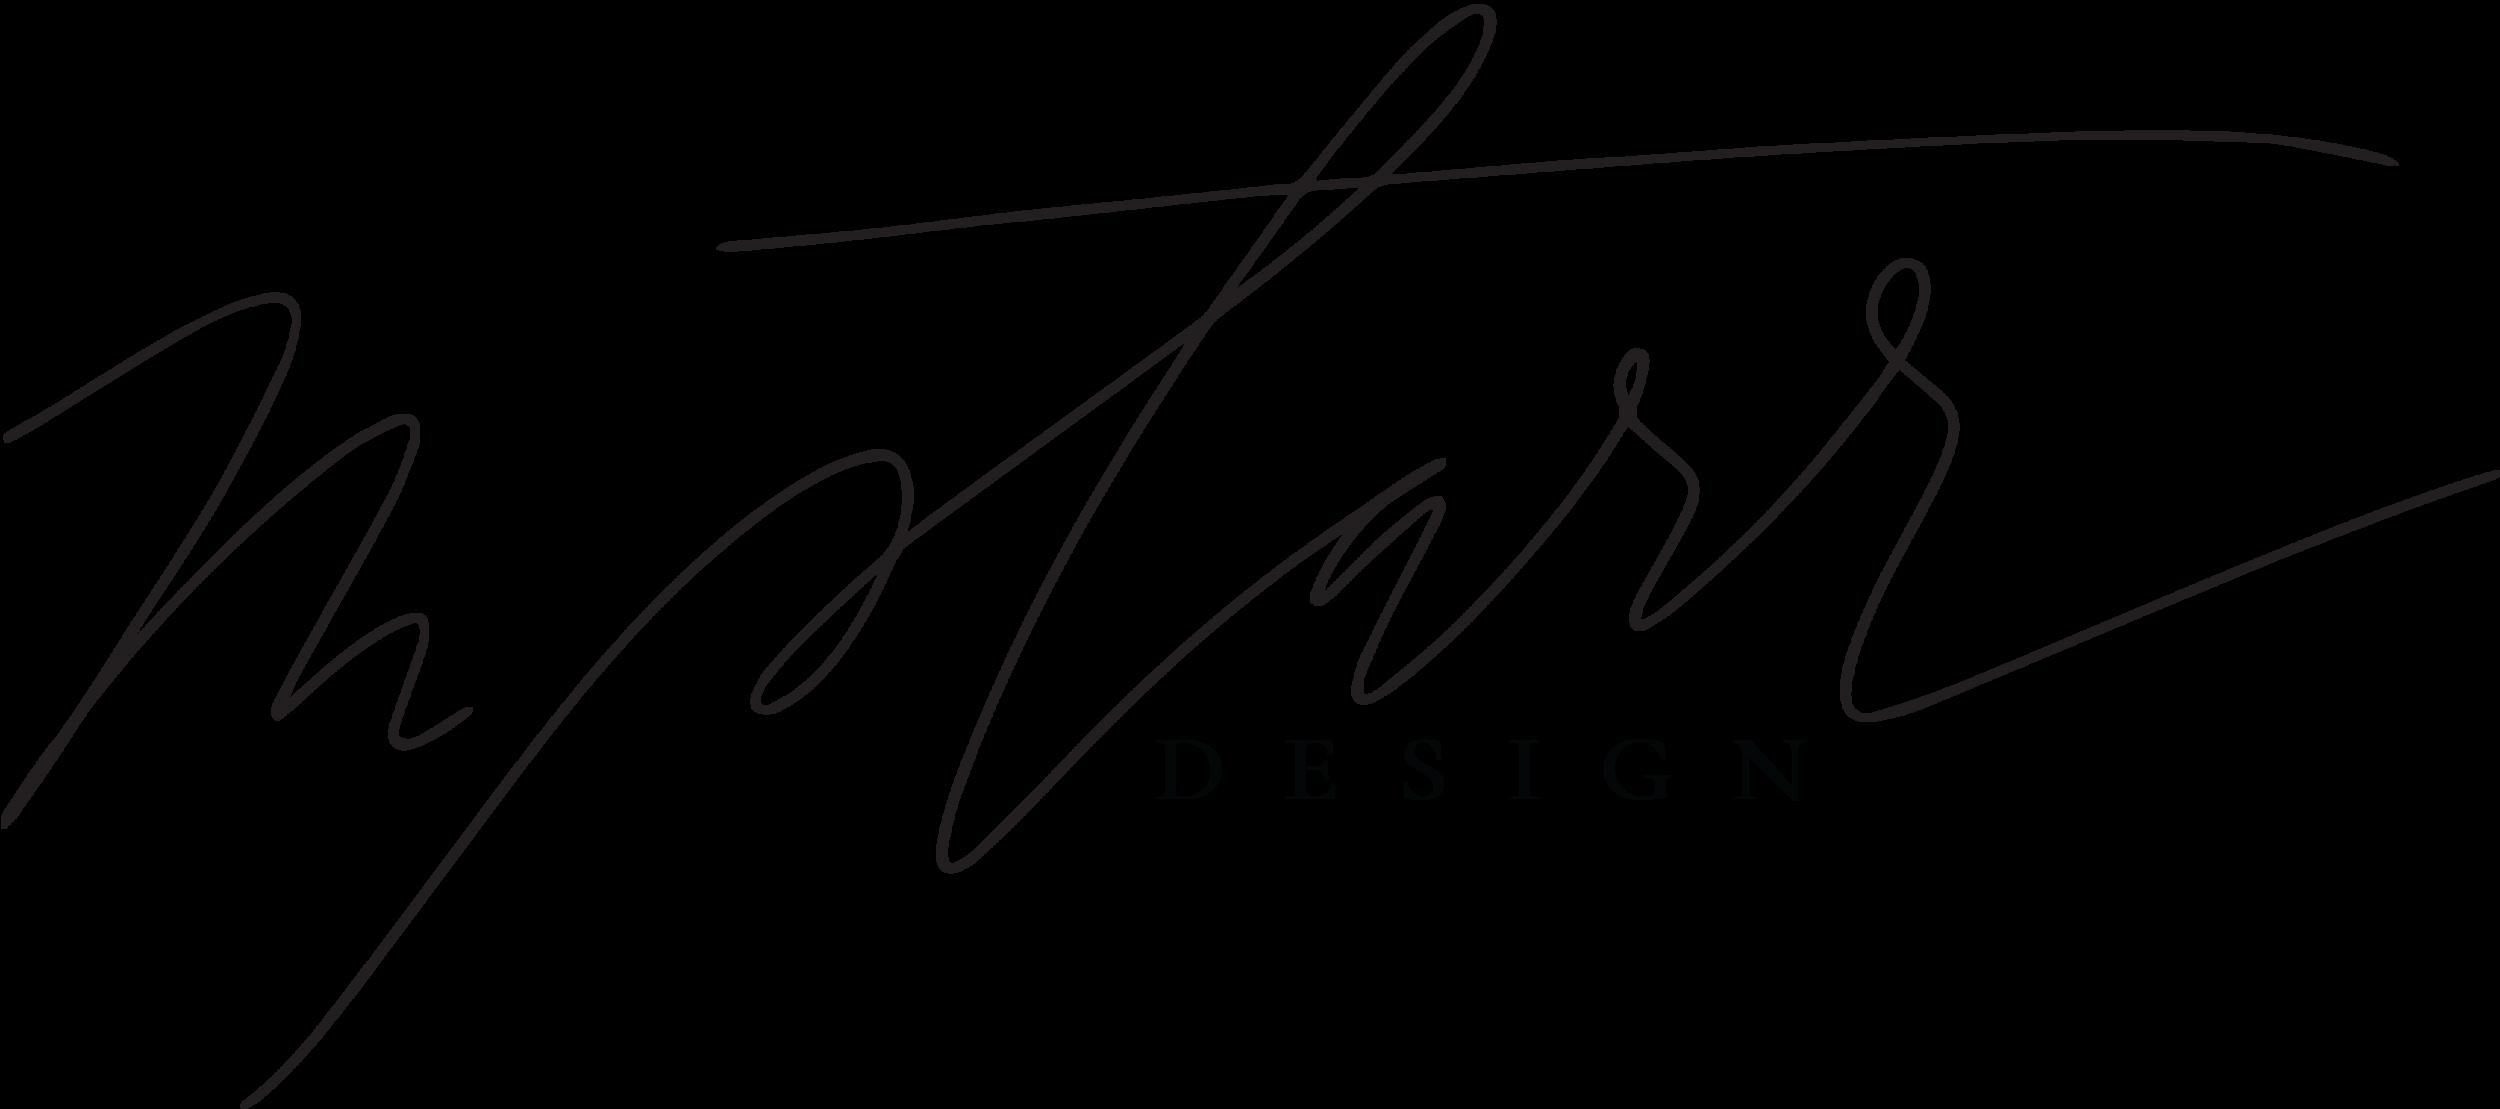 mStarr-design-final.png